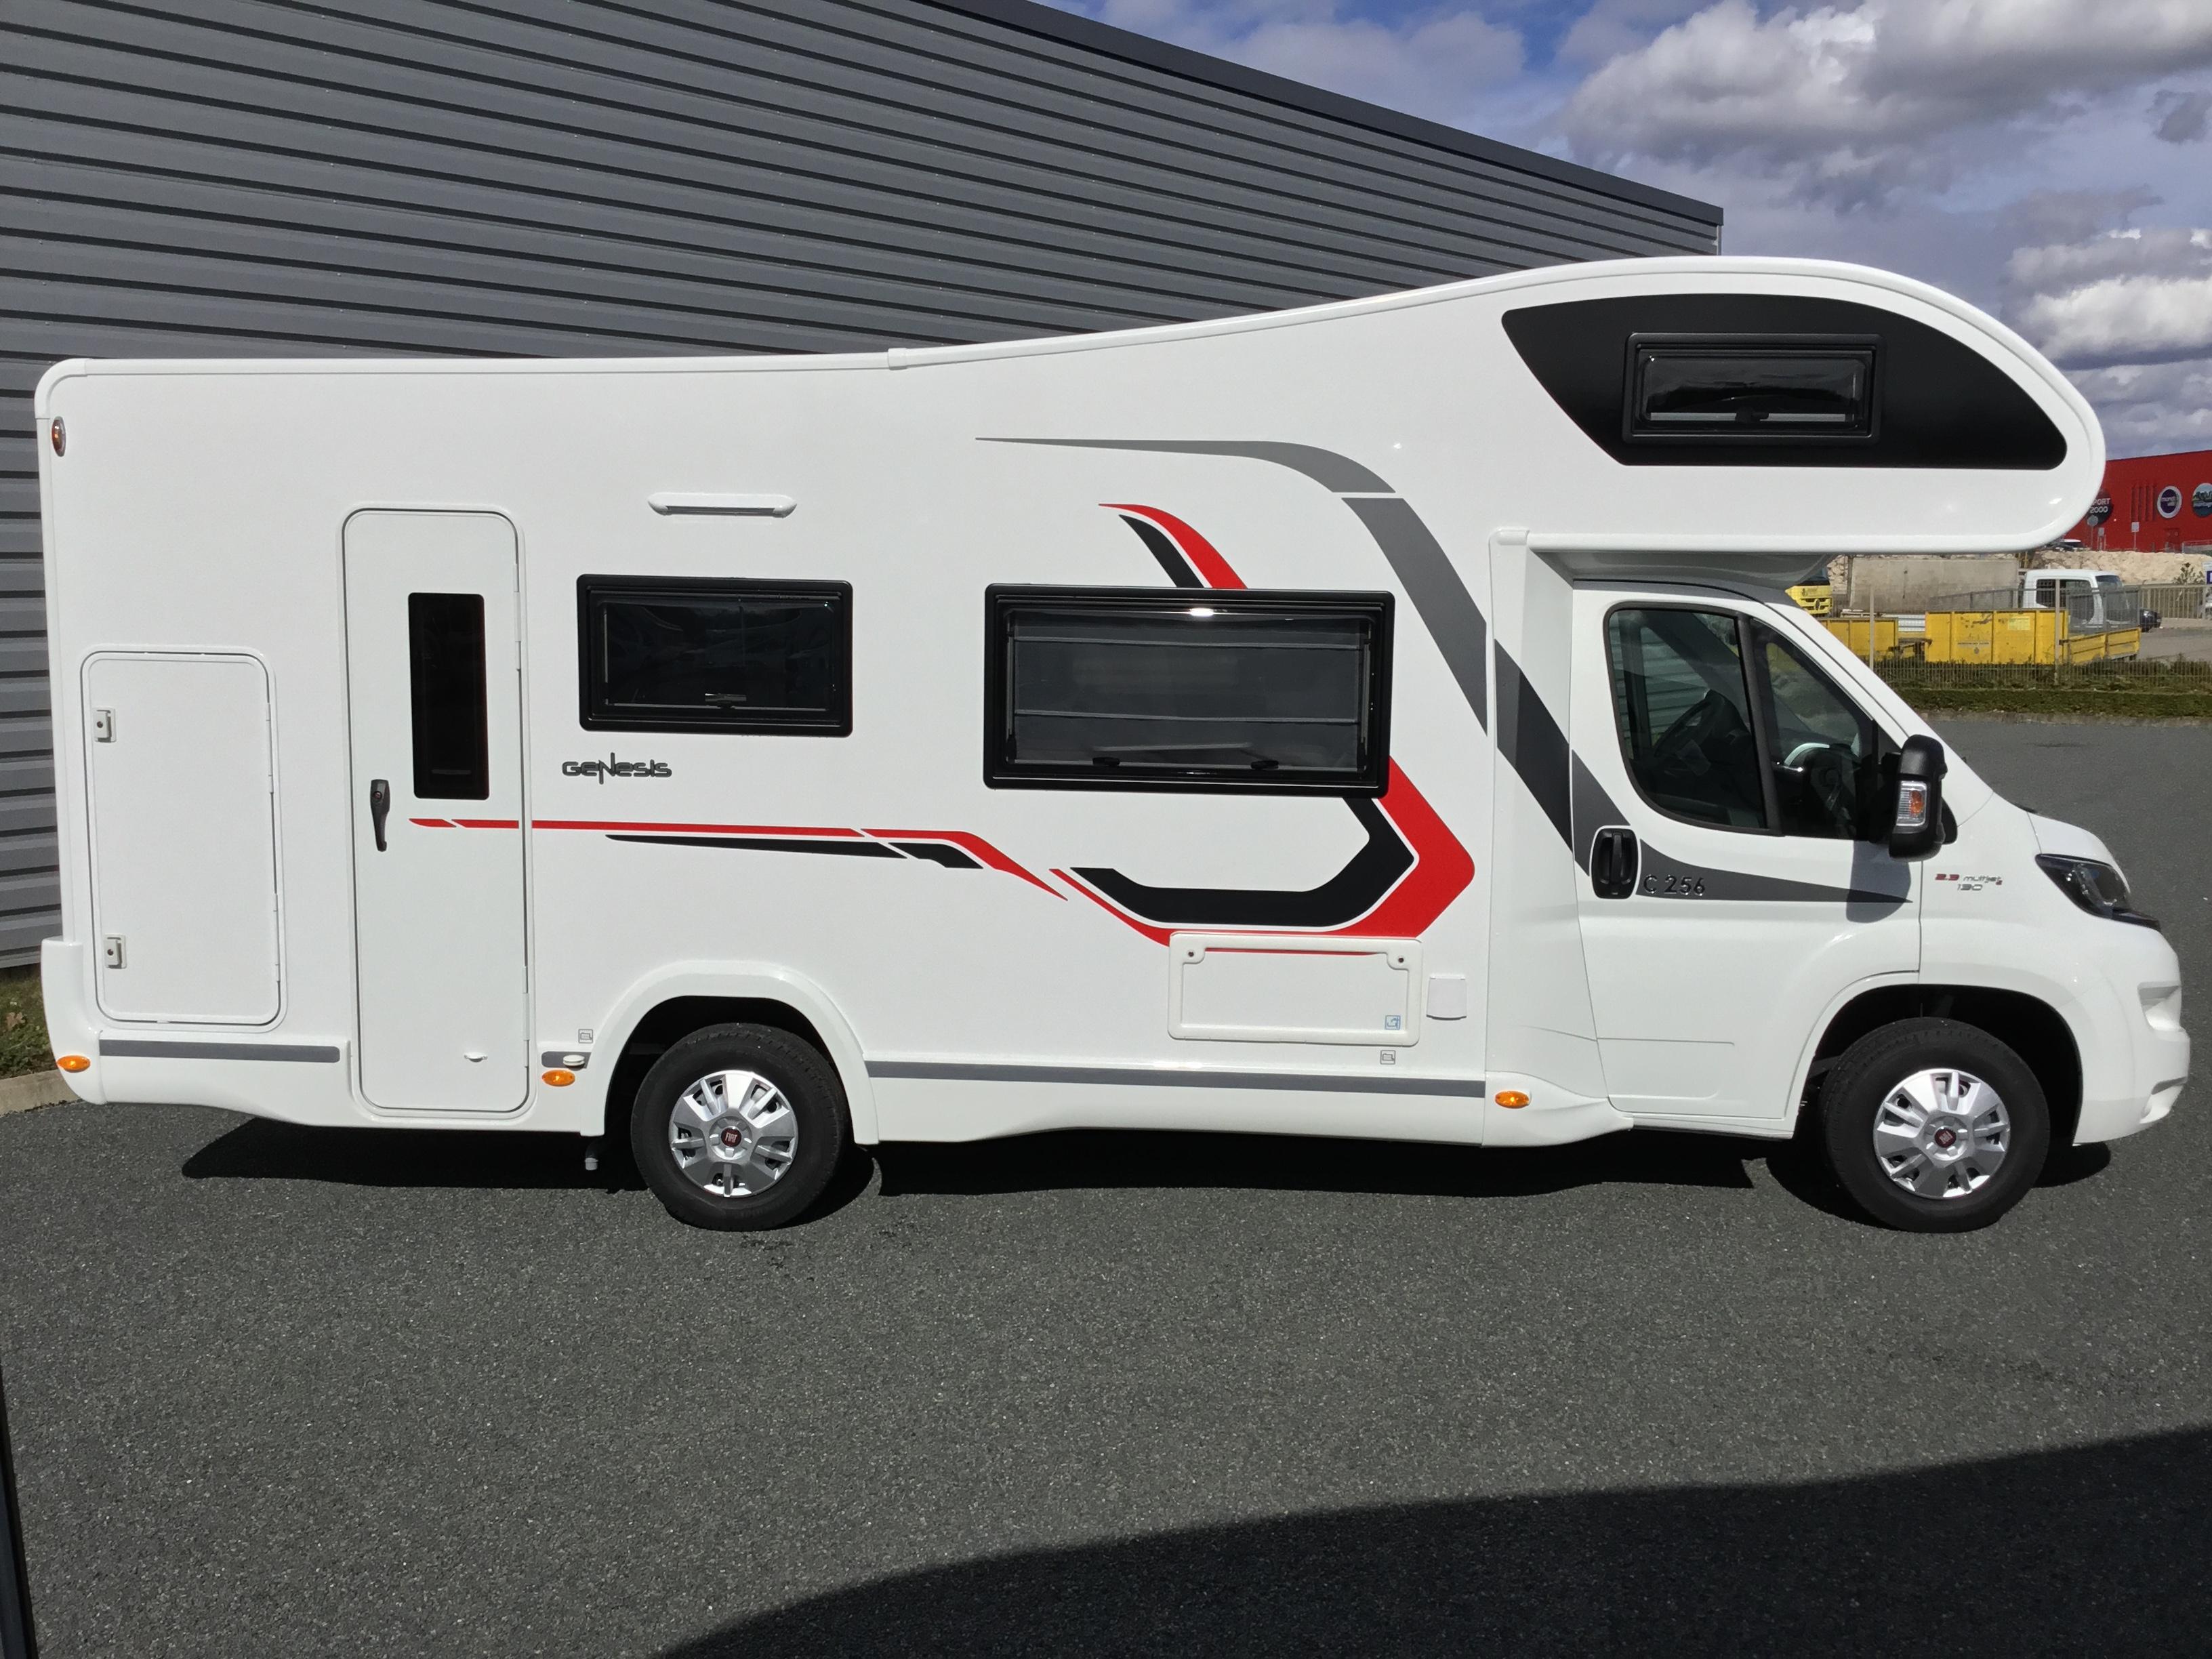 challenger c 256 neuf de 2018 fiat camping car en vente checy loiret 45. Black Bedroom Furniture Sets. Home Design Ideas